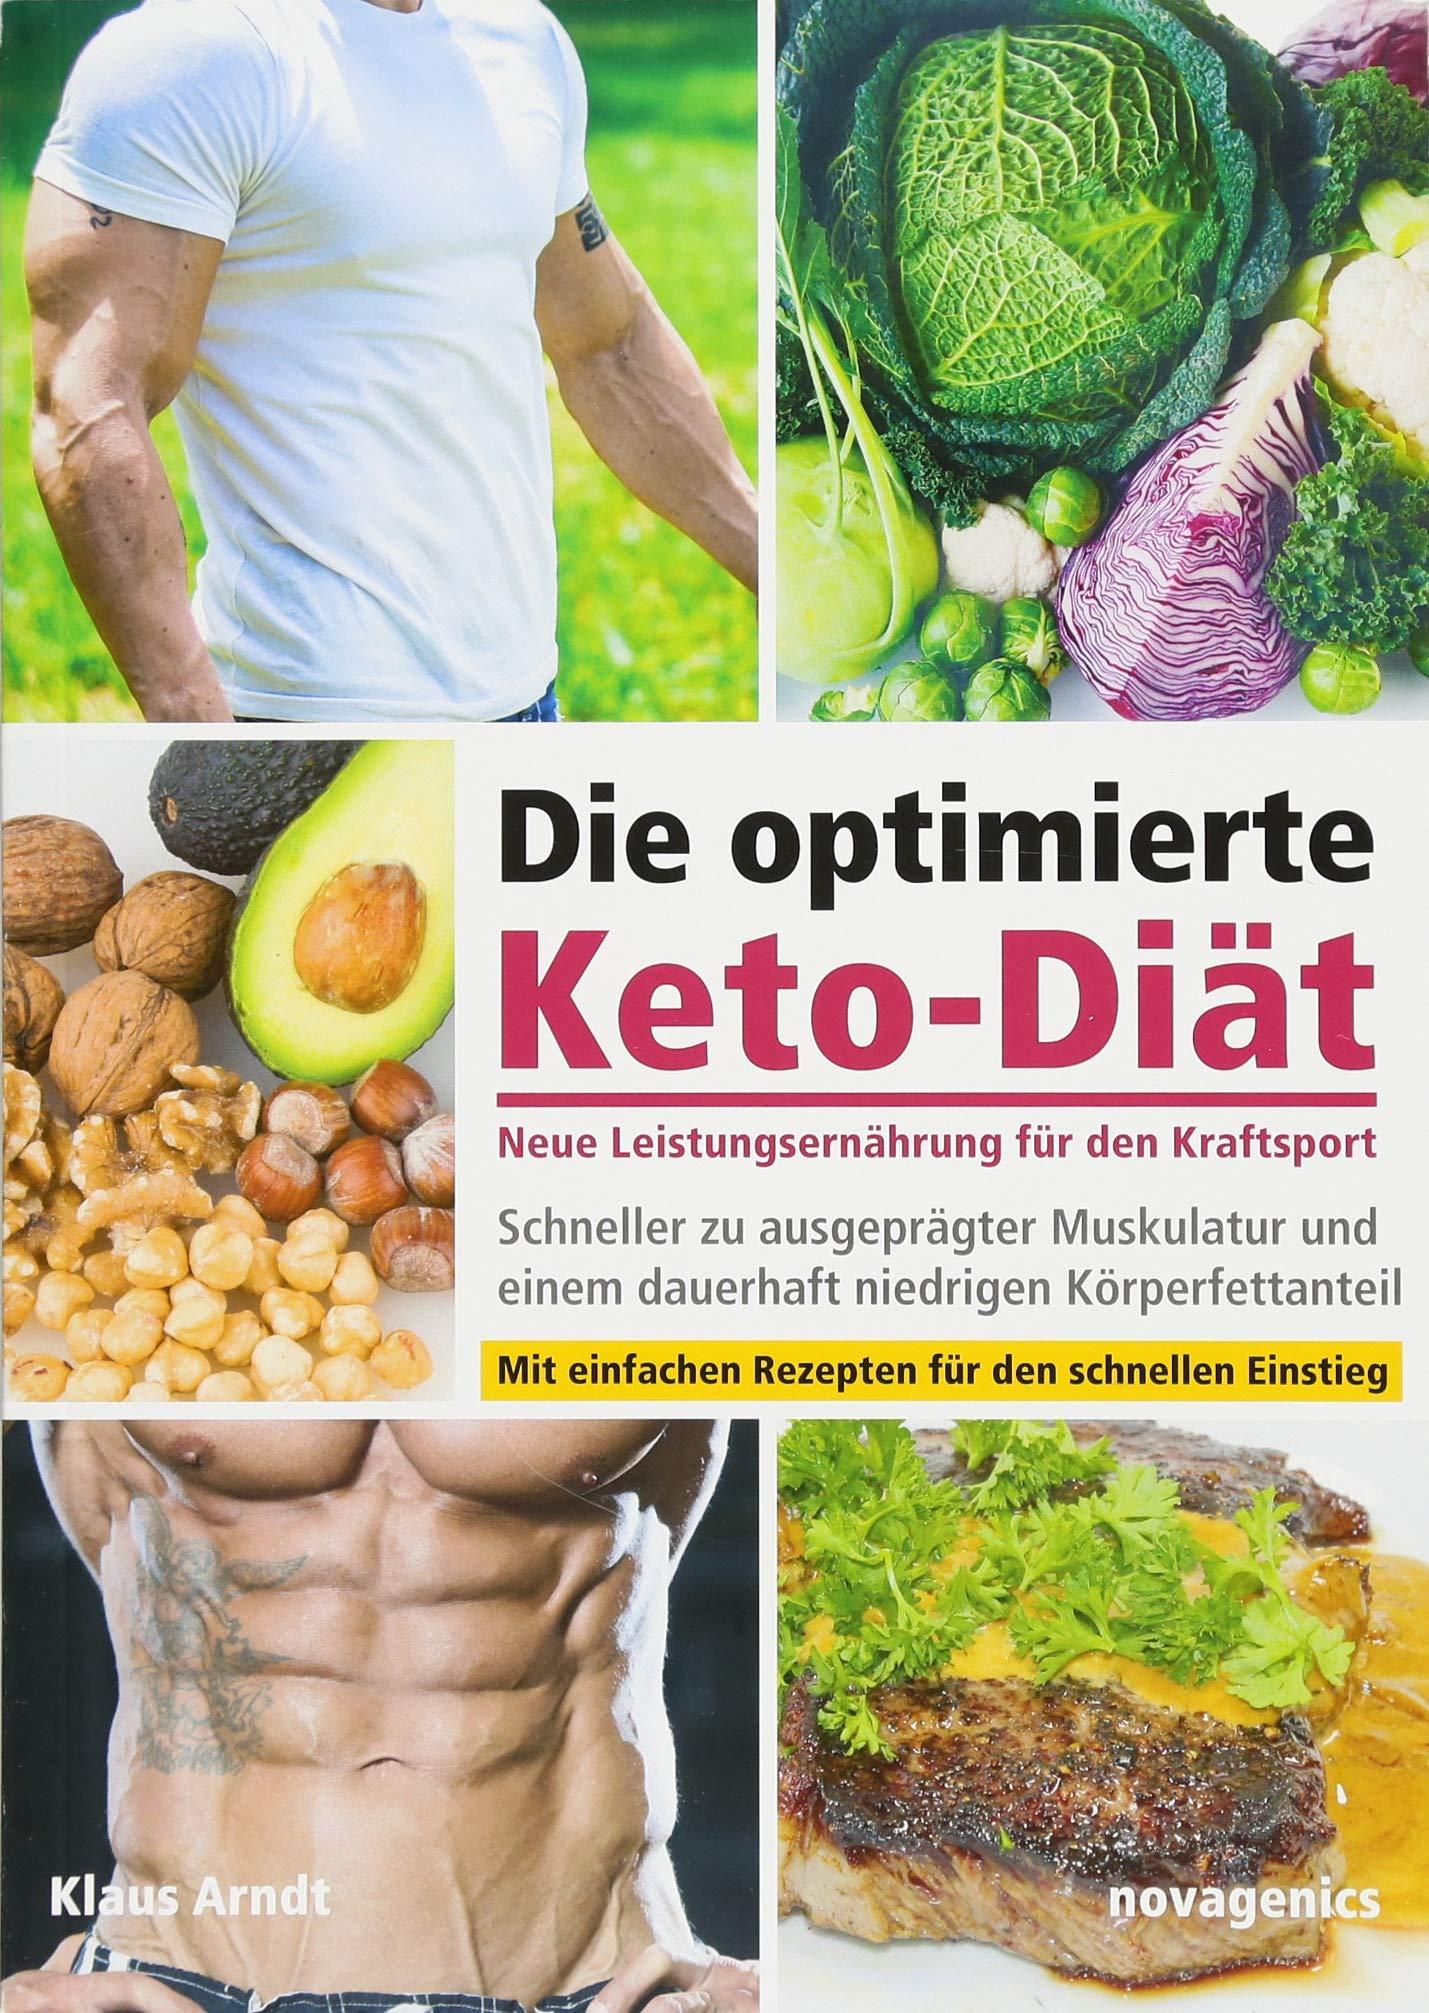 Muskelmasse Paläo-Diät gewinnen